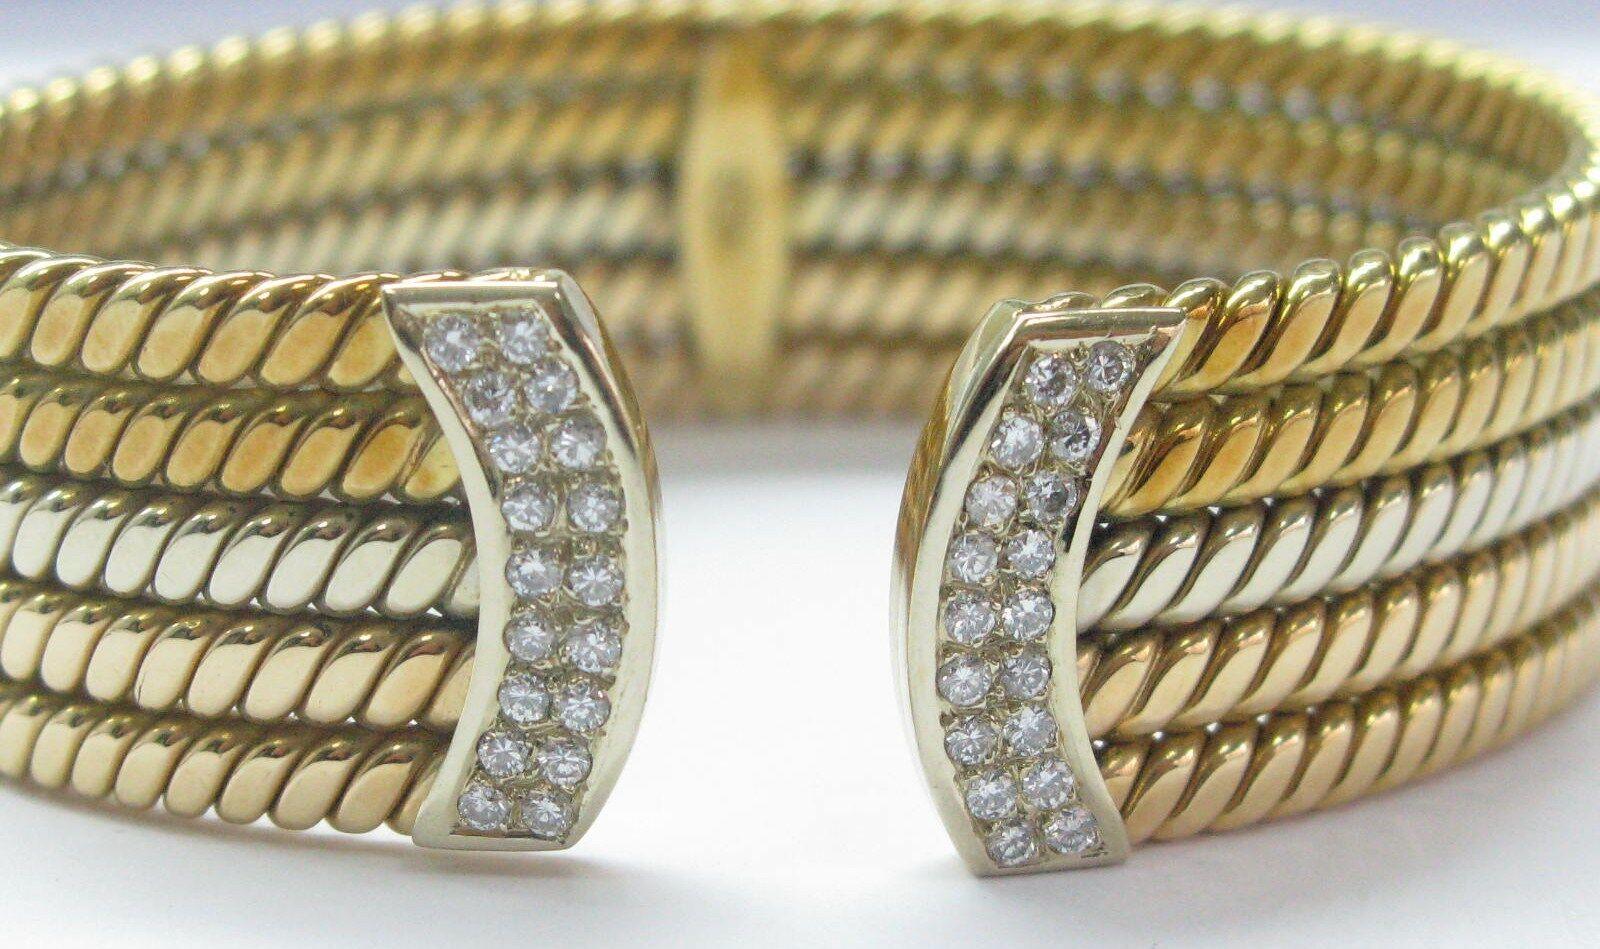 18Kt Tri color Solid gold & NATURAL Diamond Cuff Bracelet .85CT 19.6mm WIDE